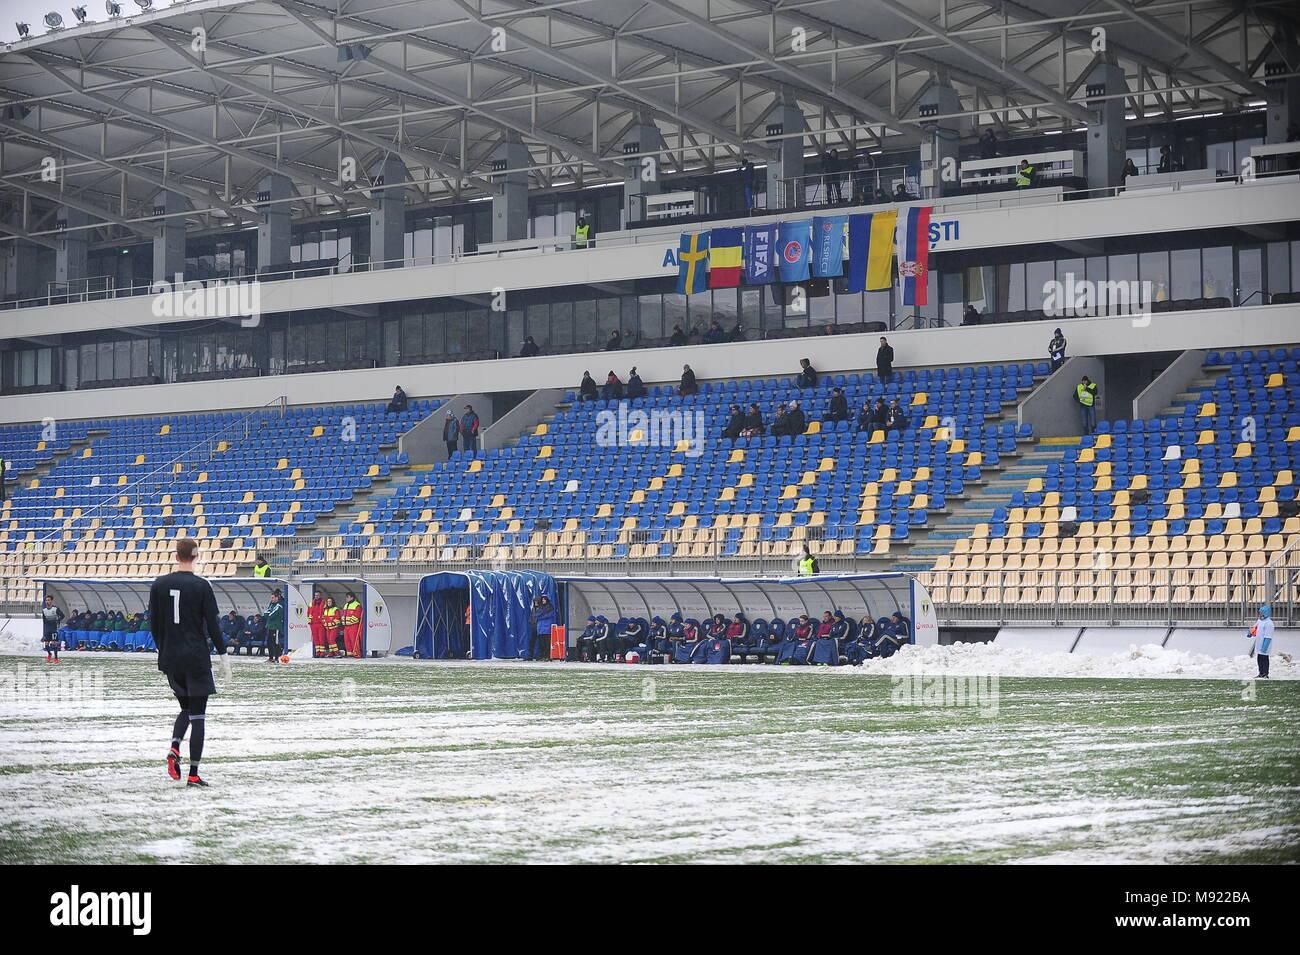 The empty tribunes of the Ilie Oana Stadium in loiesti, Romania - UEFA European Under 19 Championship 2018, Elite Round -  game between Sweden and Ukraine, Photo: Cronos/Cristian Stavri, Ploiesti, 21.March.2018 - Stock Image